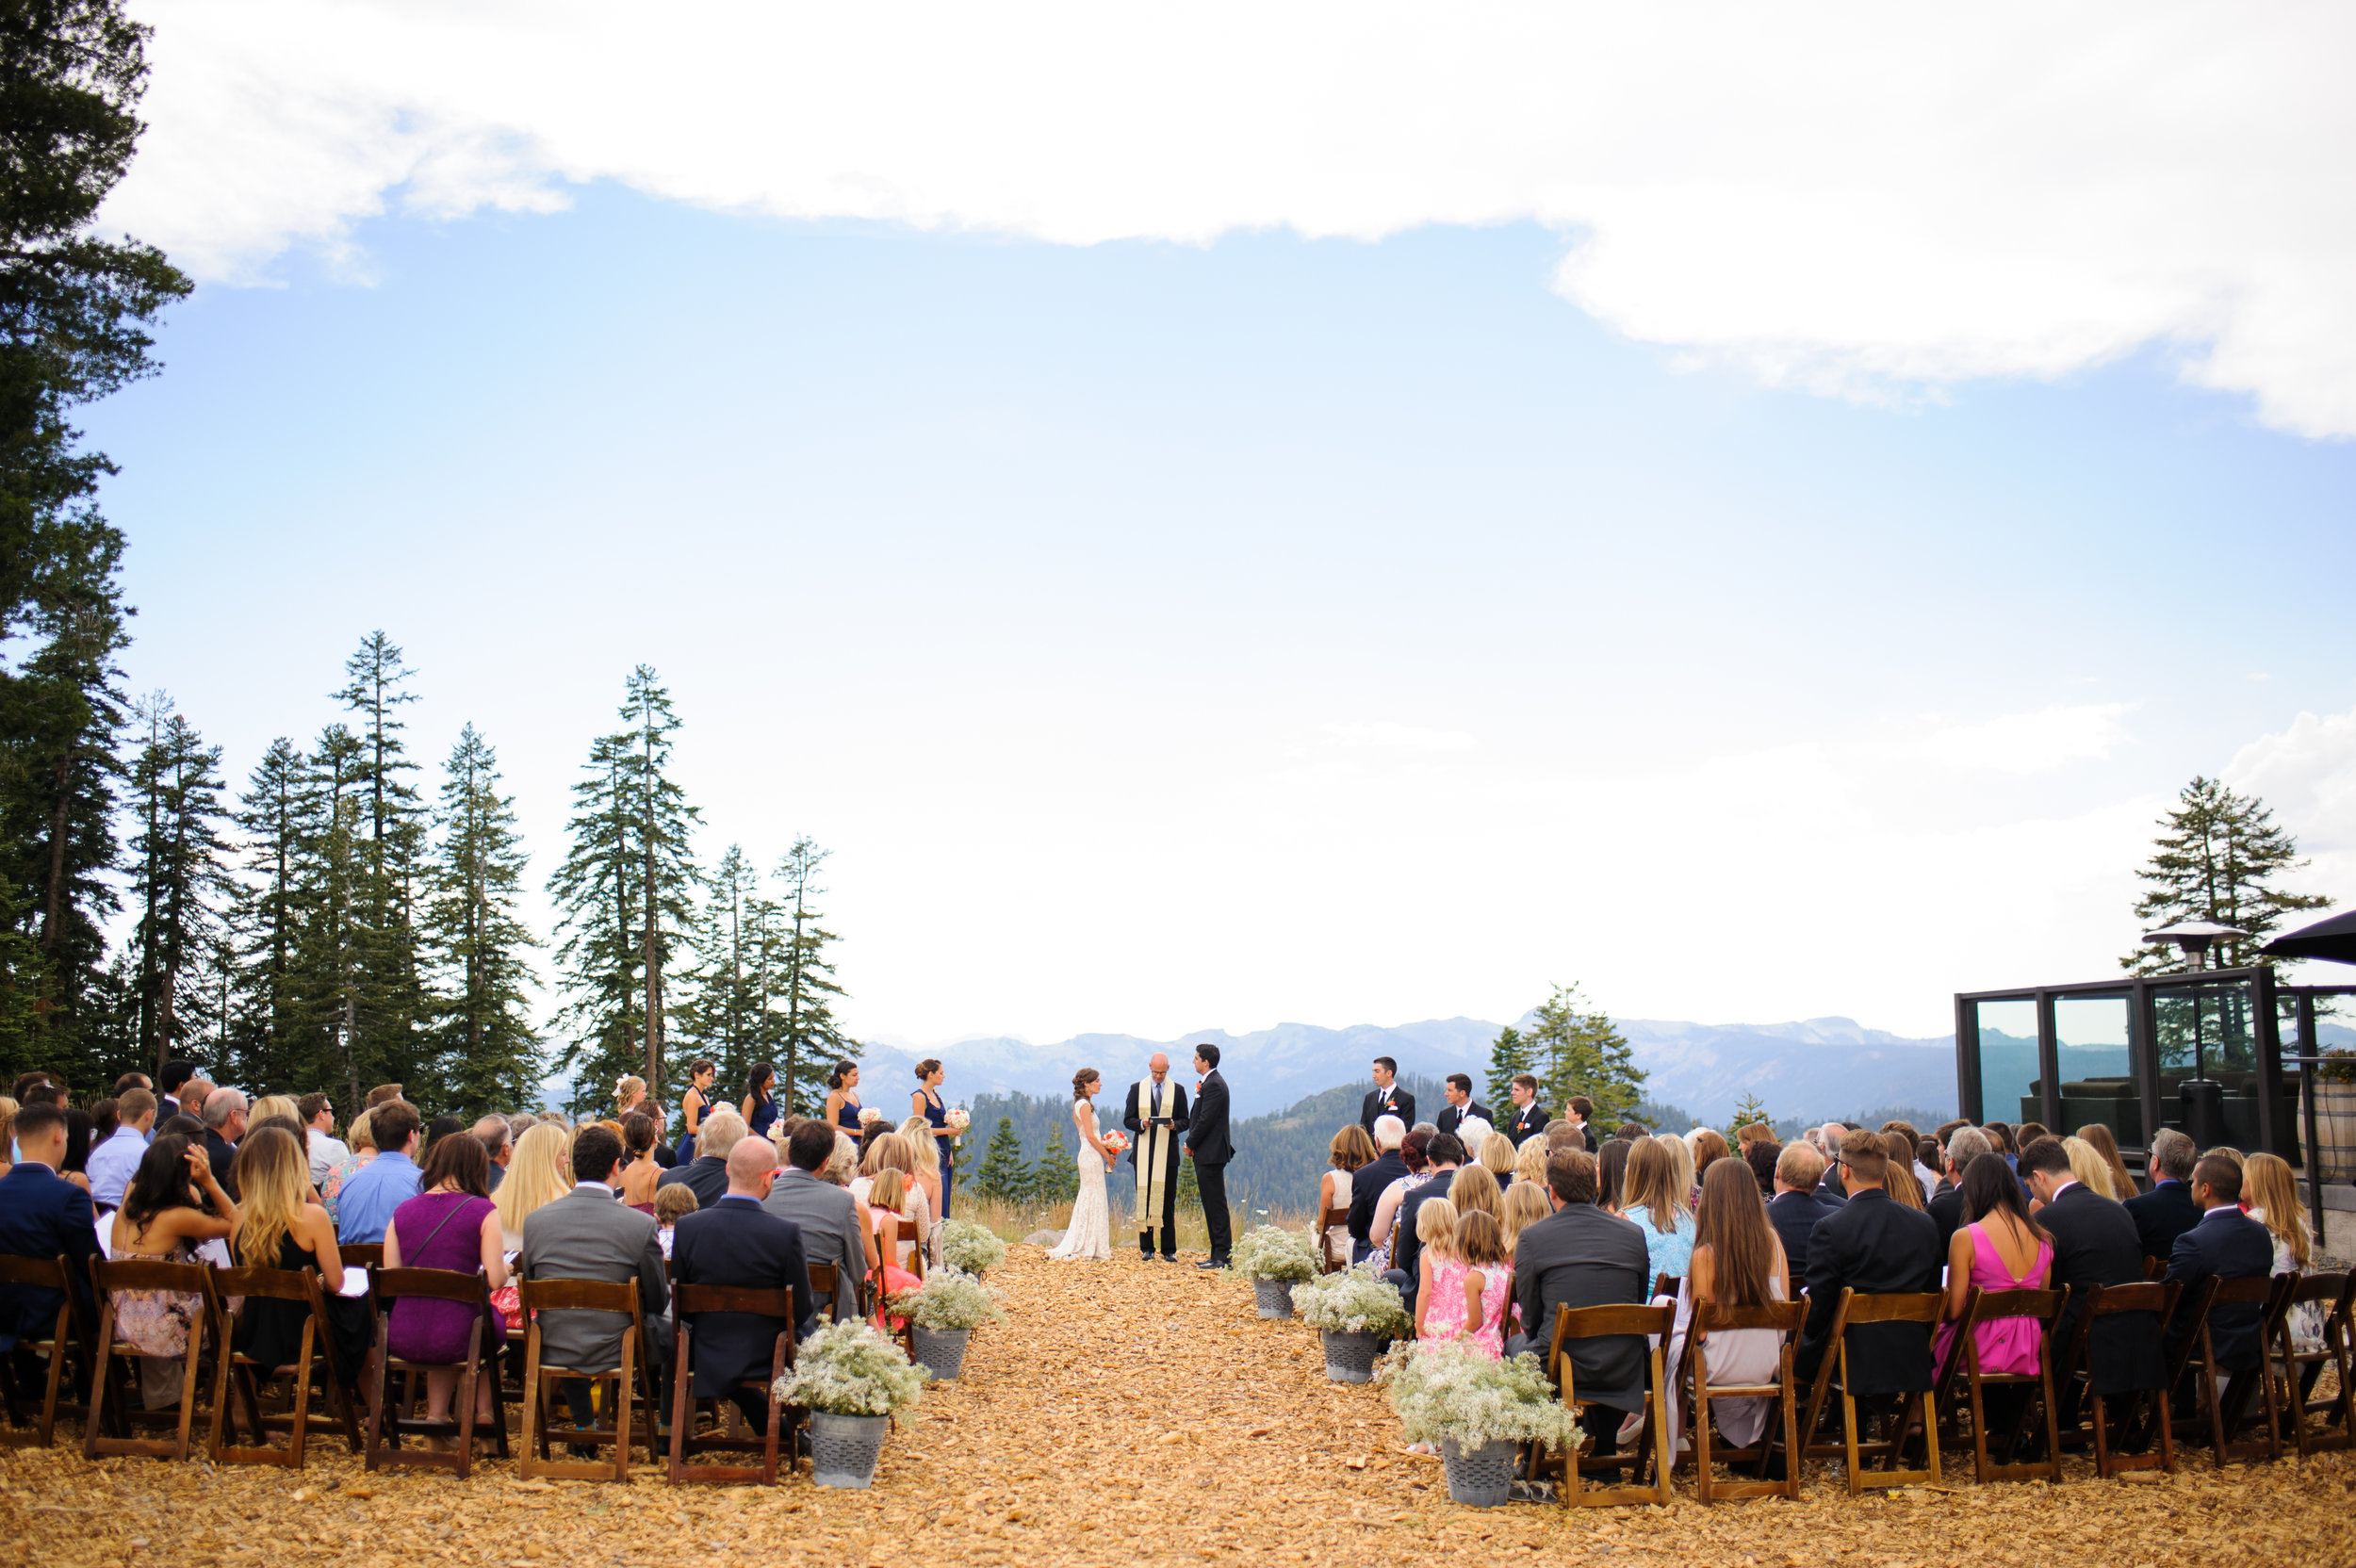 katie-myles-017-northstar-resort-tahoe-wedding-photographer-katherine-nicole-photography.JPG